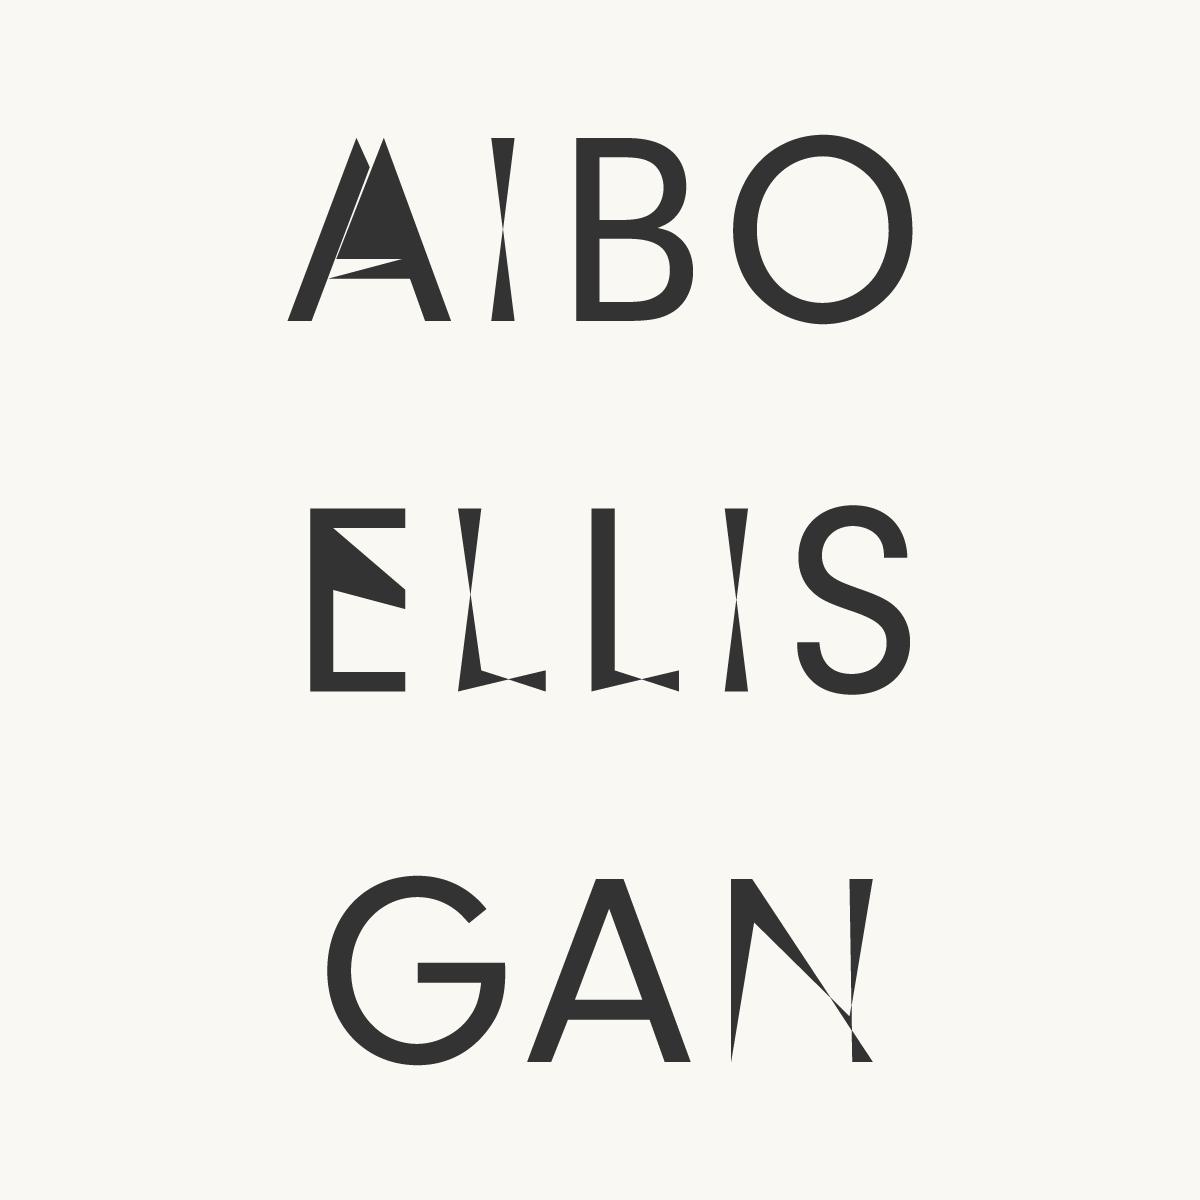 typeface-02